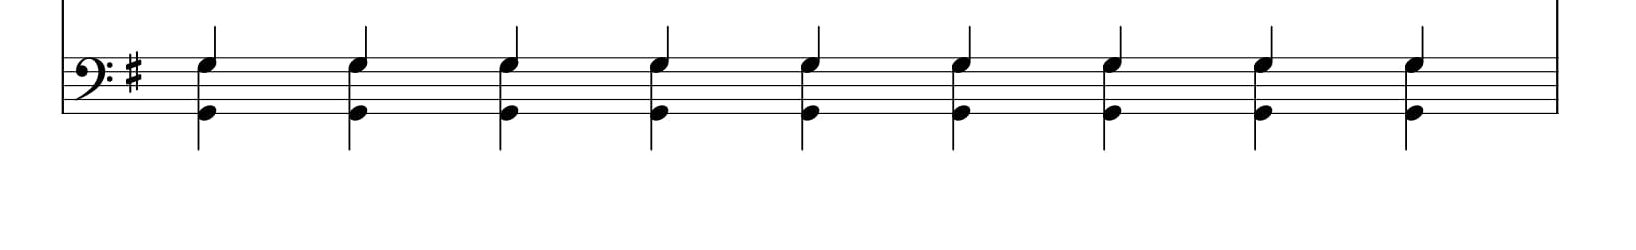 Прокимен, 2 глас, знаменный распев